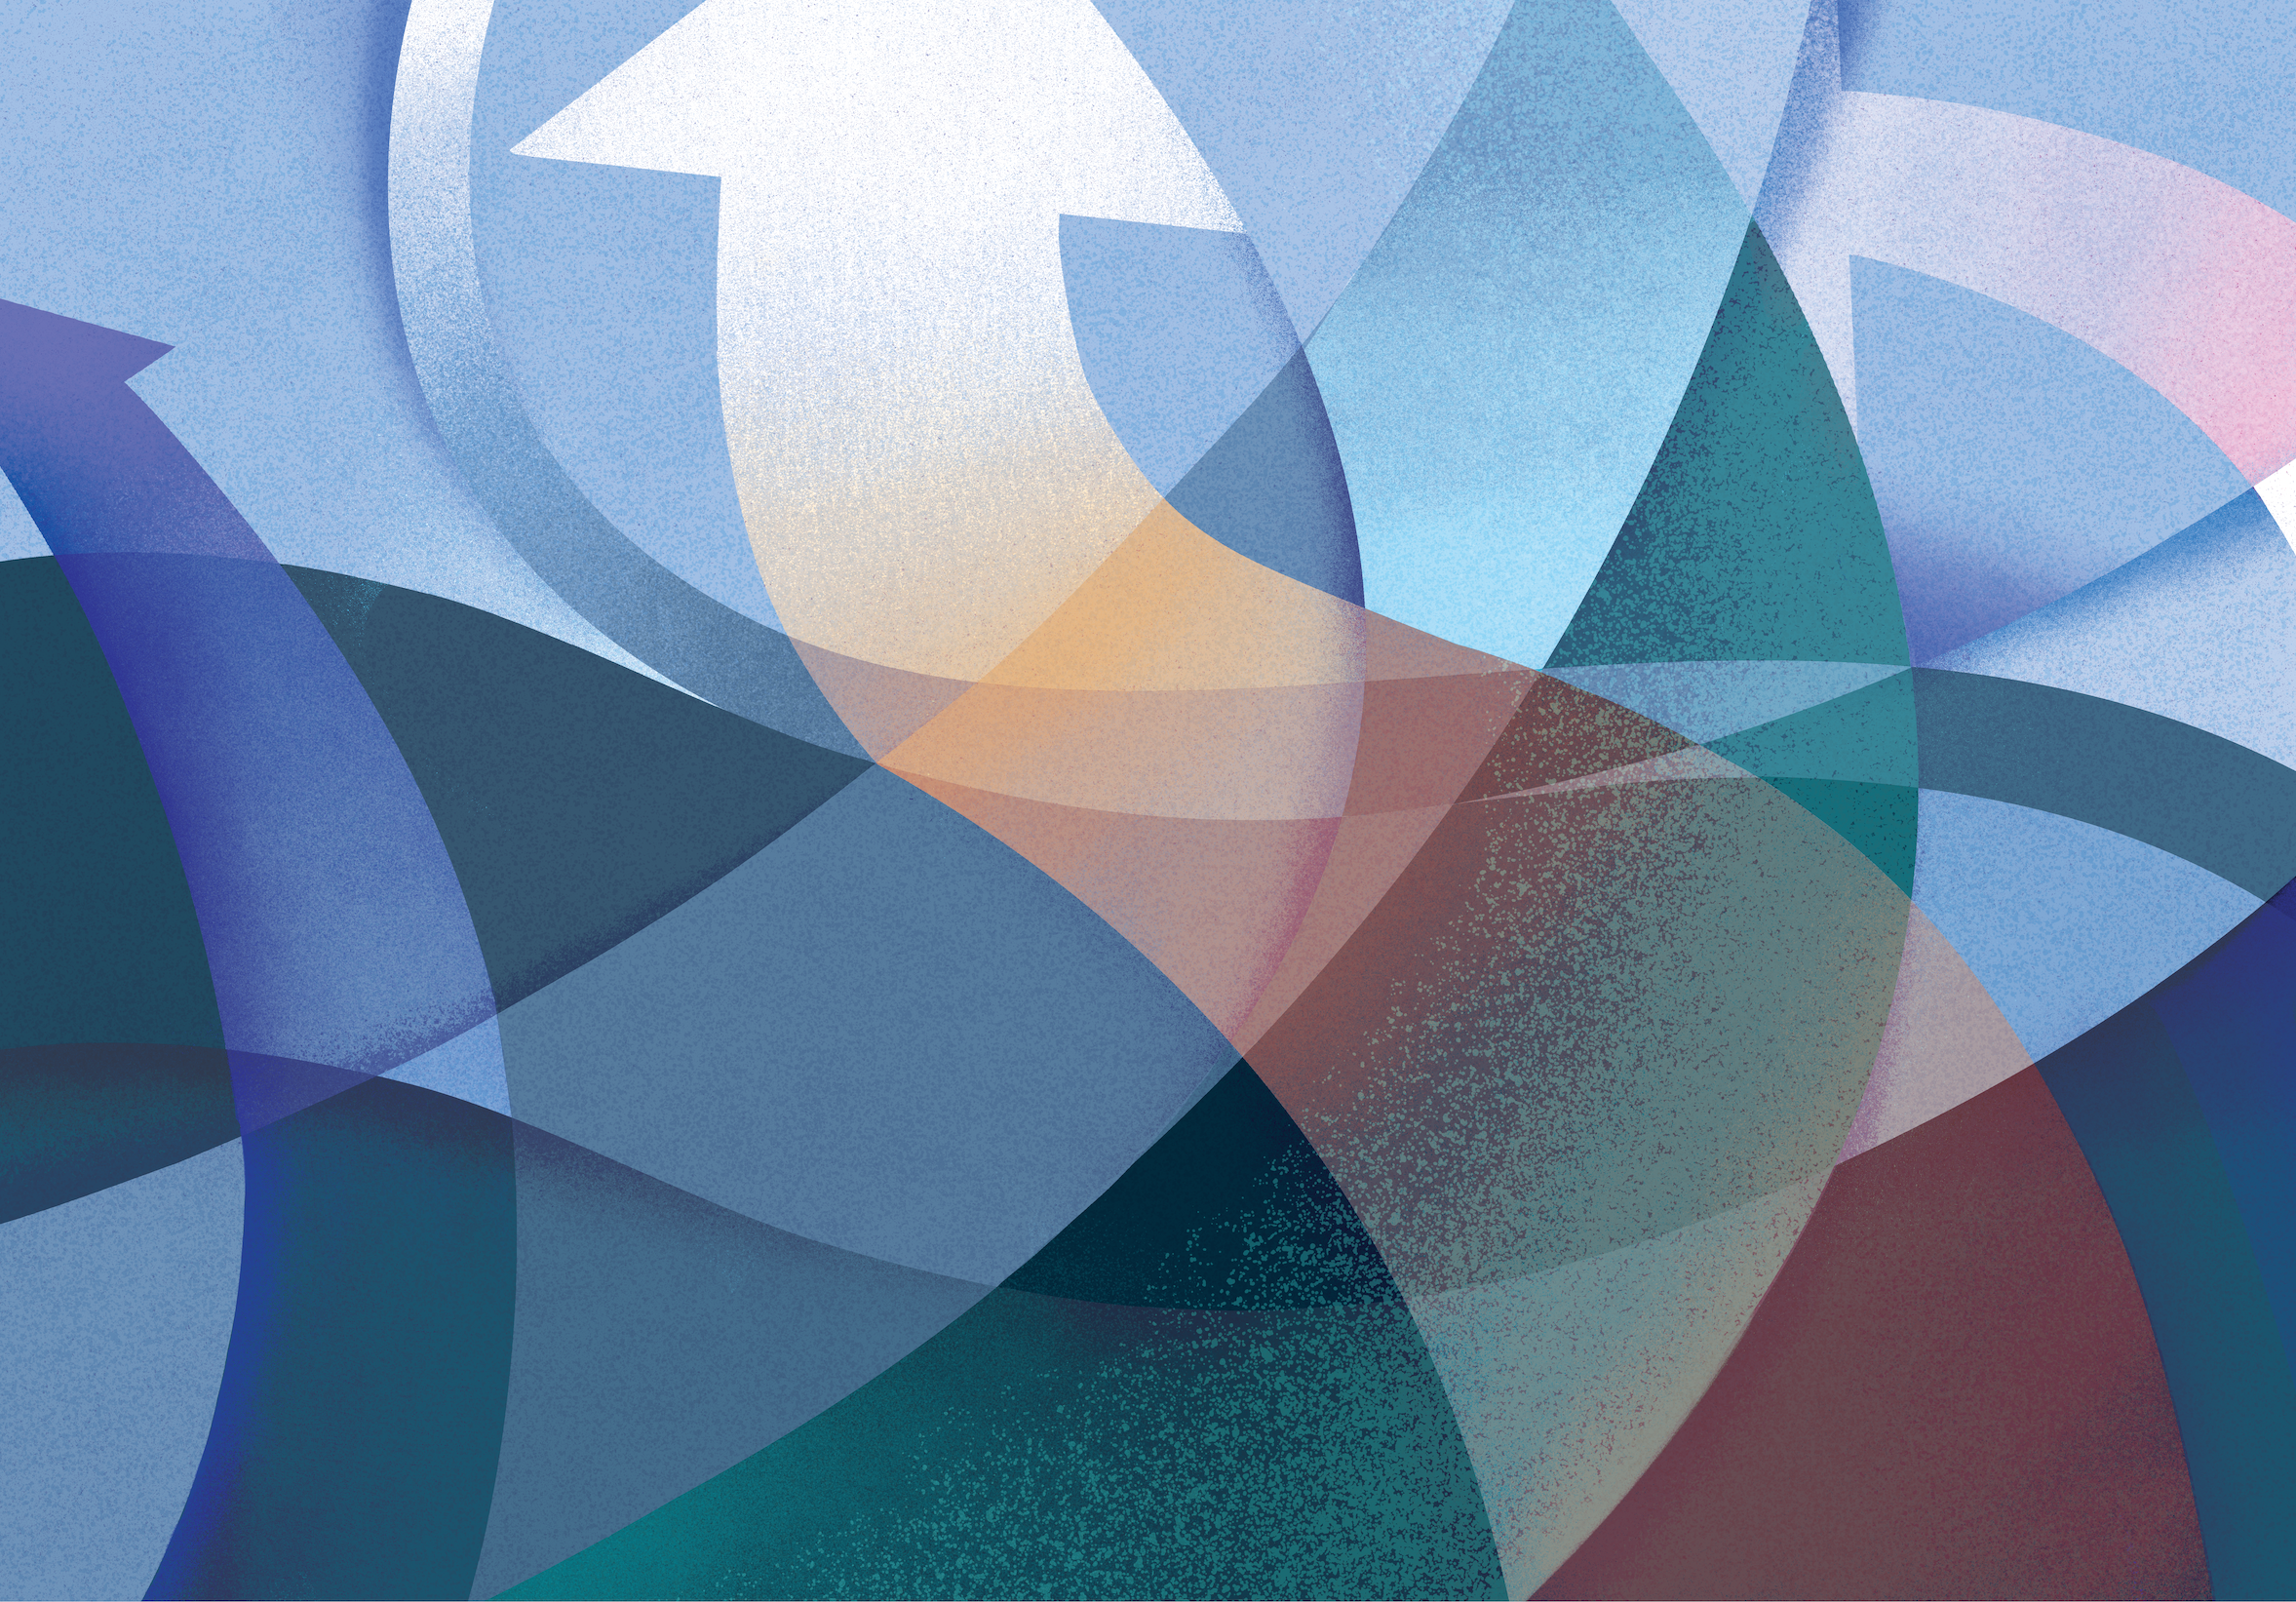 Global Competitiveness Report 2019 World Economic Forum